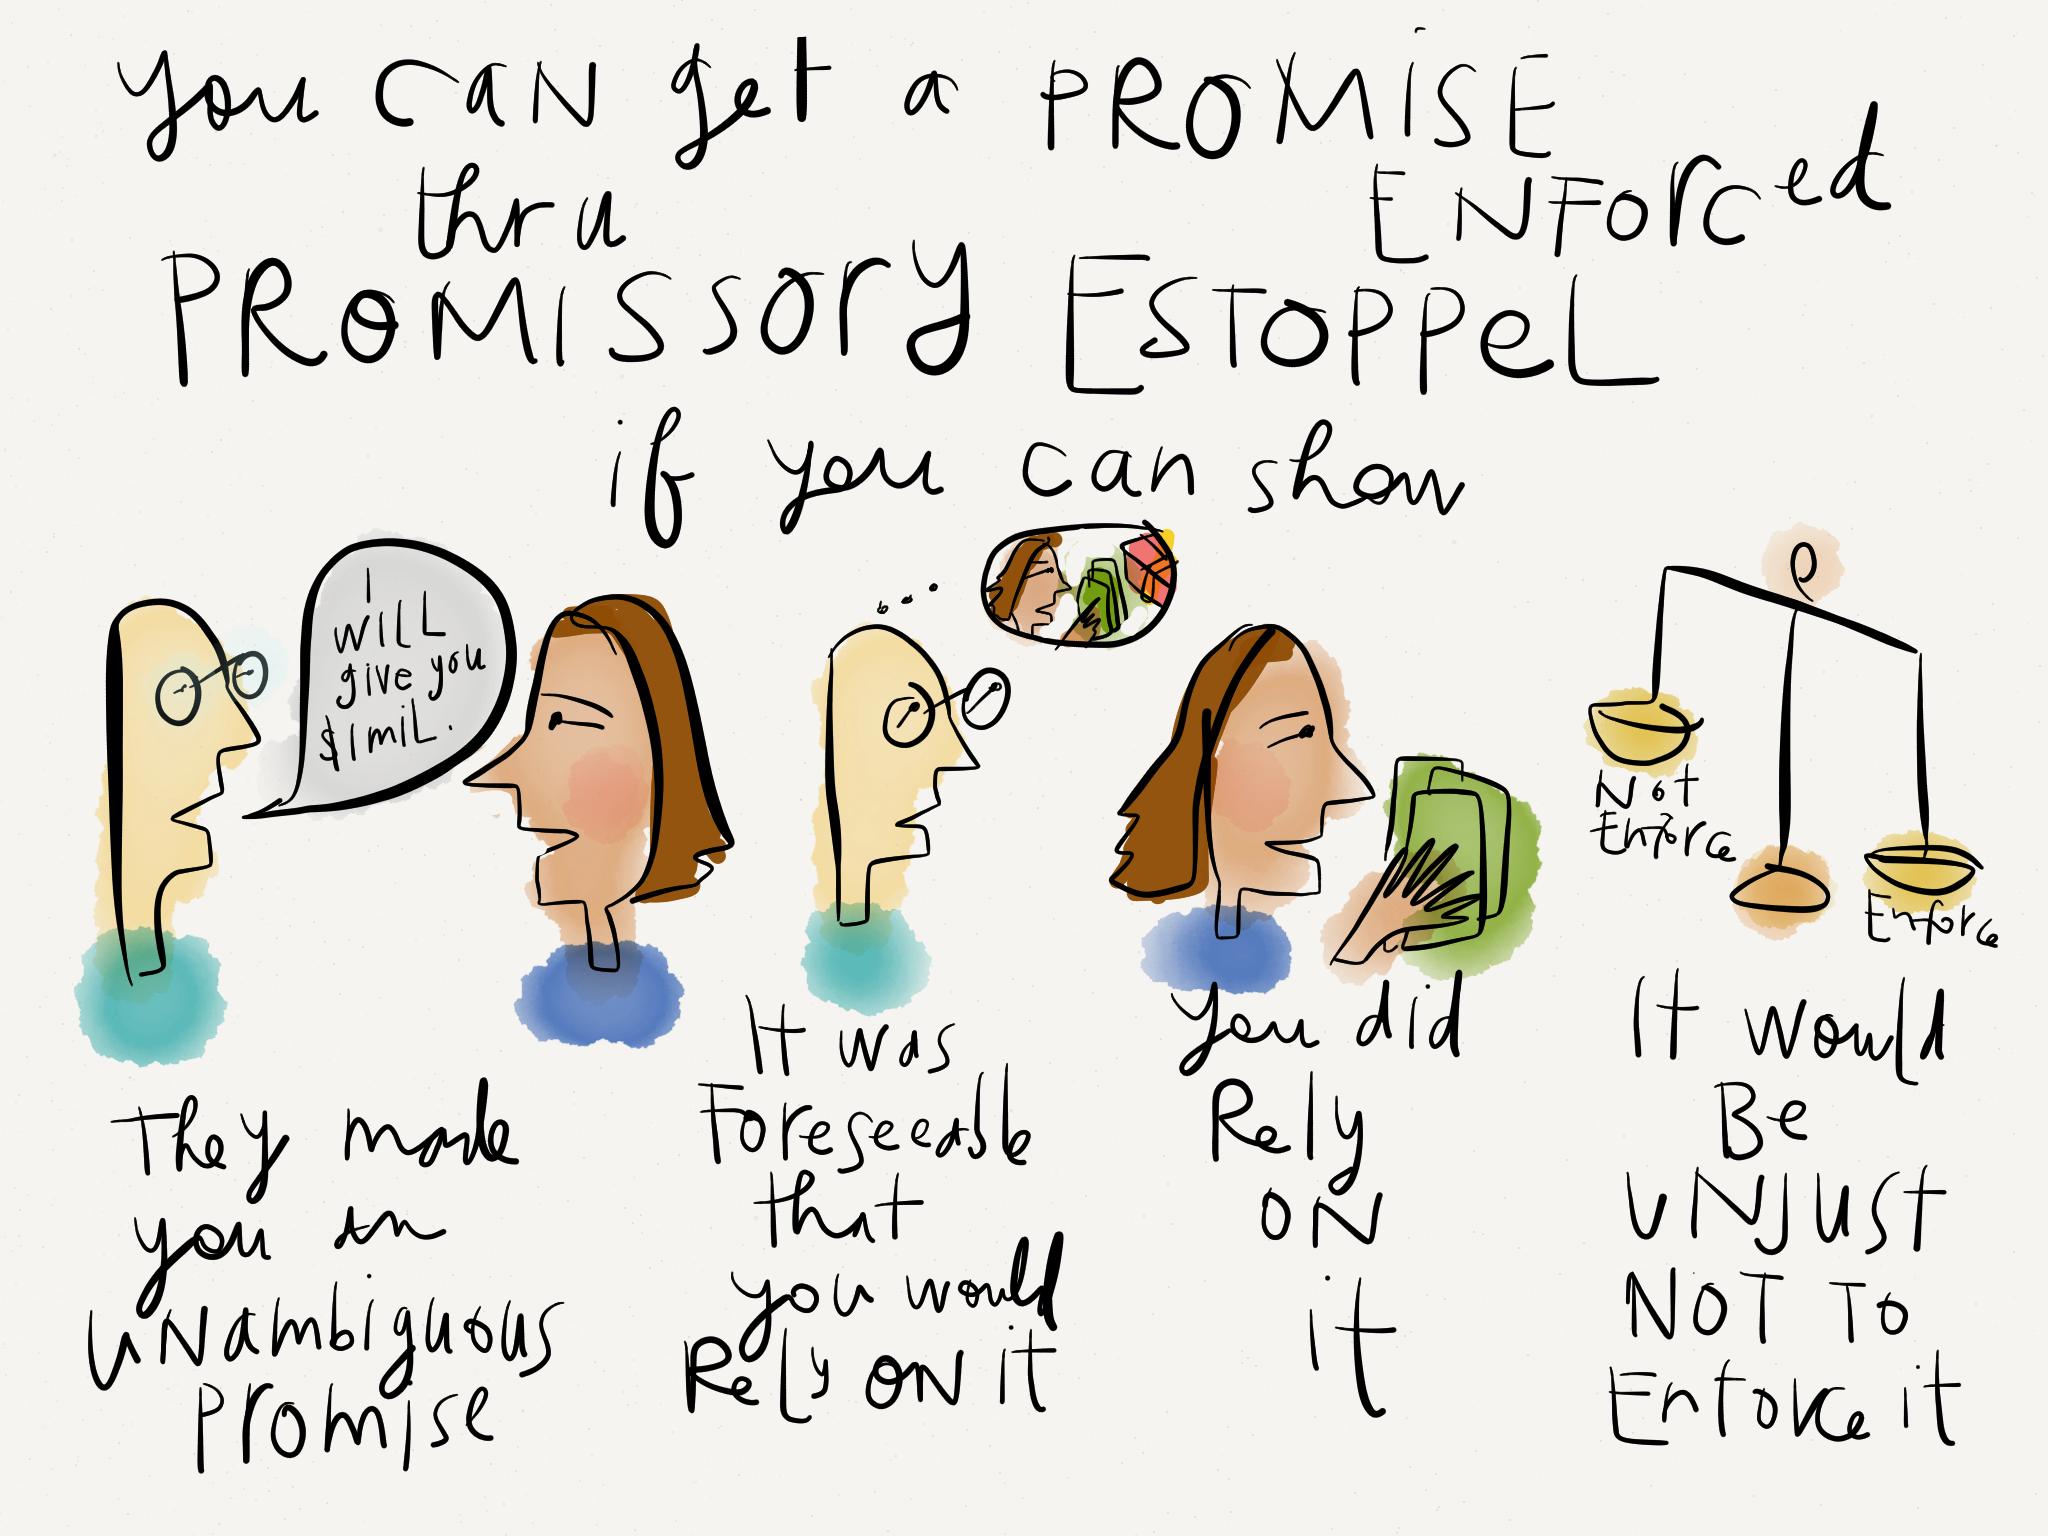 Enforcing Promises through Promissory Estoppel